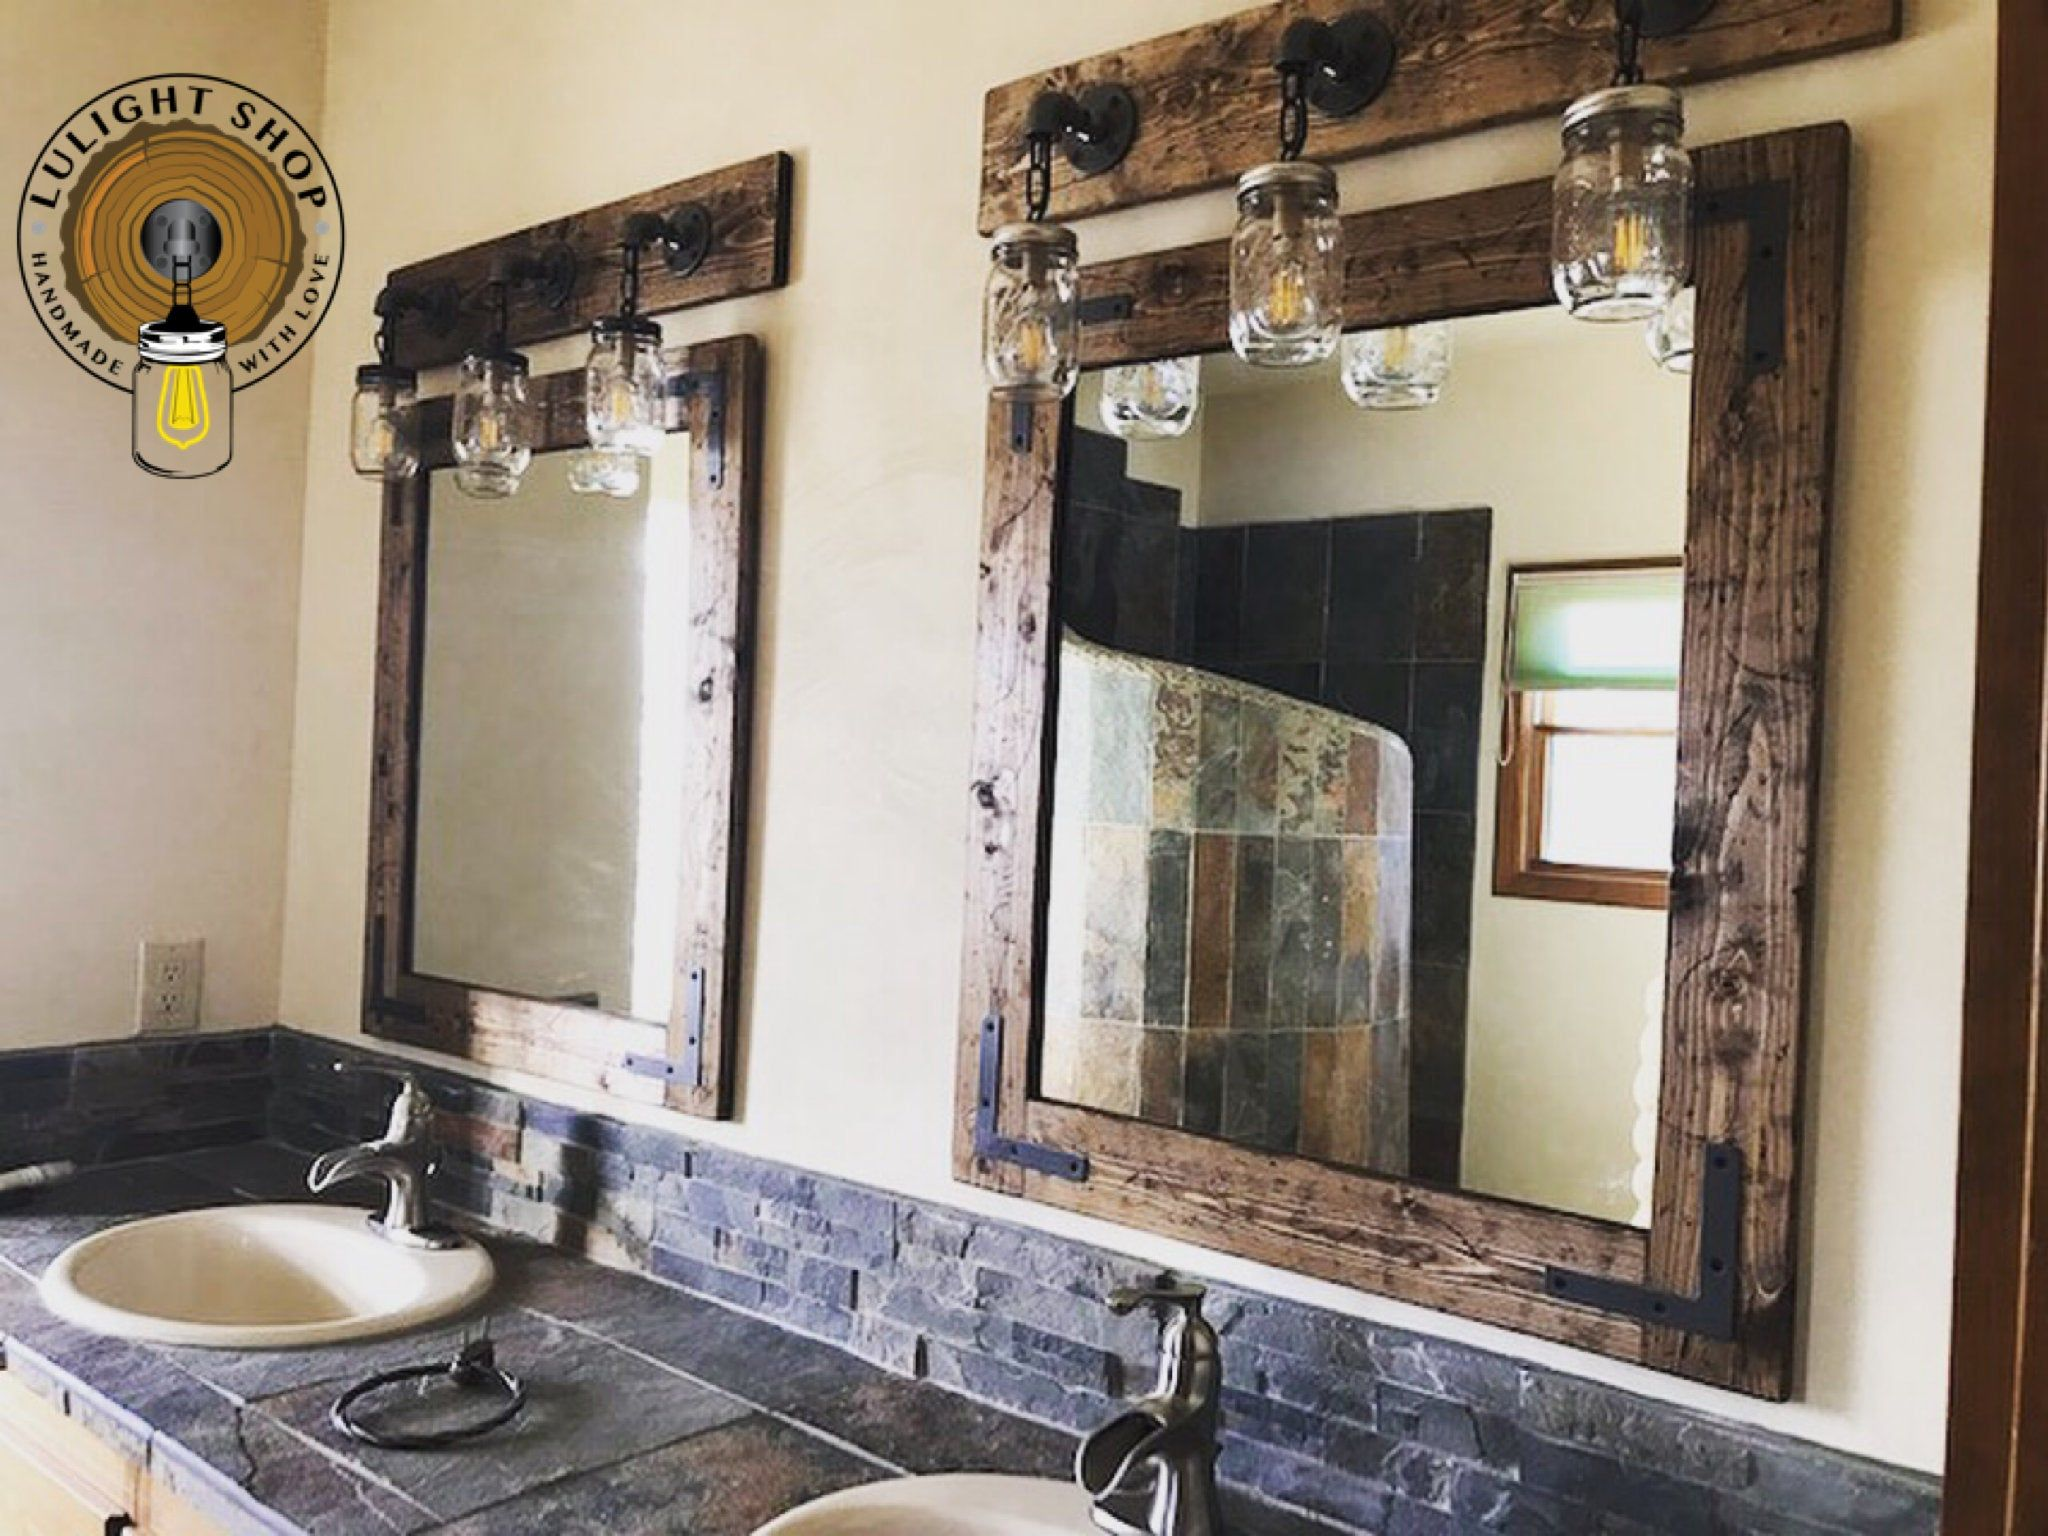 Rustic Distresssed Mirror Wall Mirror Rustic Mirror Farmhouse Decor Bathroom Mirror Full Length Mirror Floor Mirror Vanity Mirrors Farmhouse Mirrors Distressed Mirror Rustic Mirrors Rustic mirror for bathroom